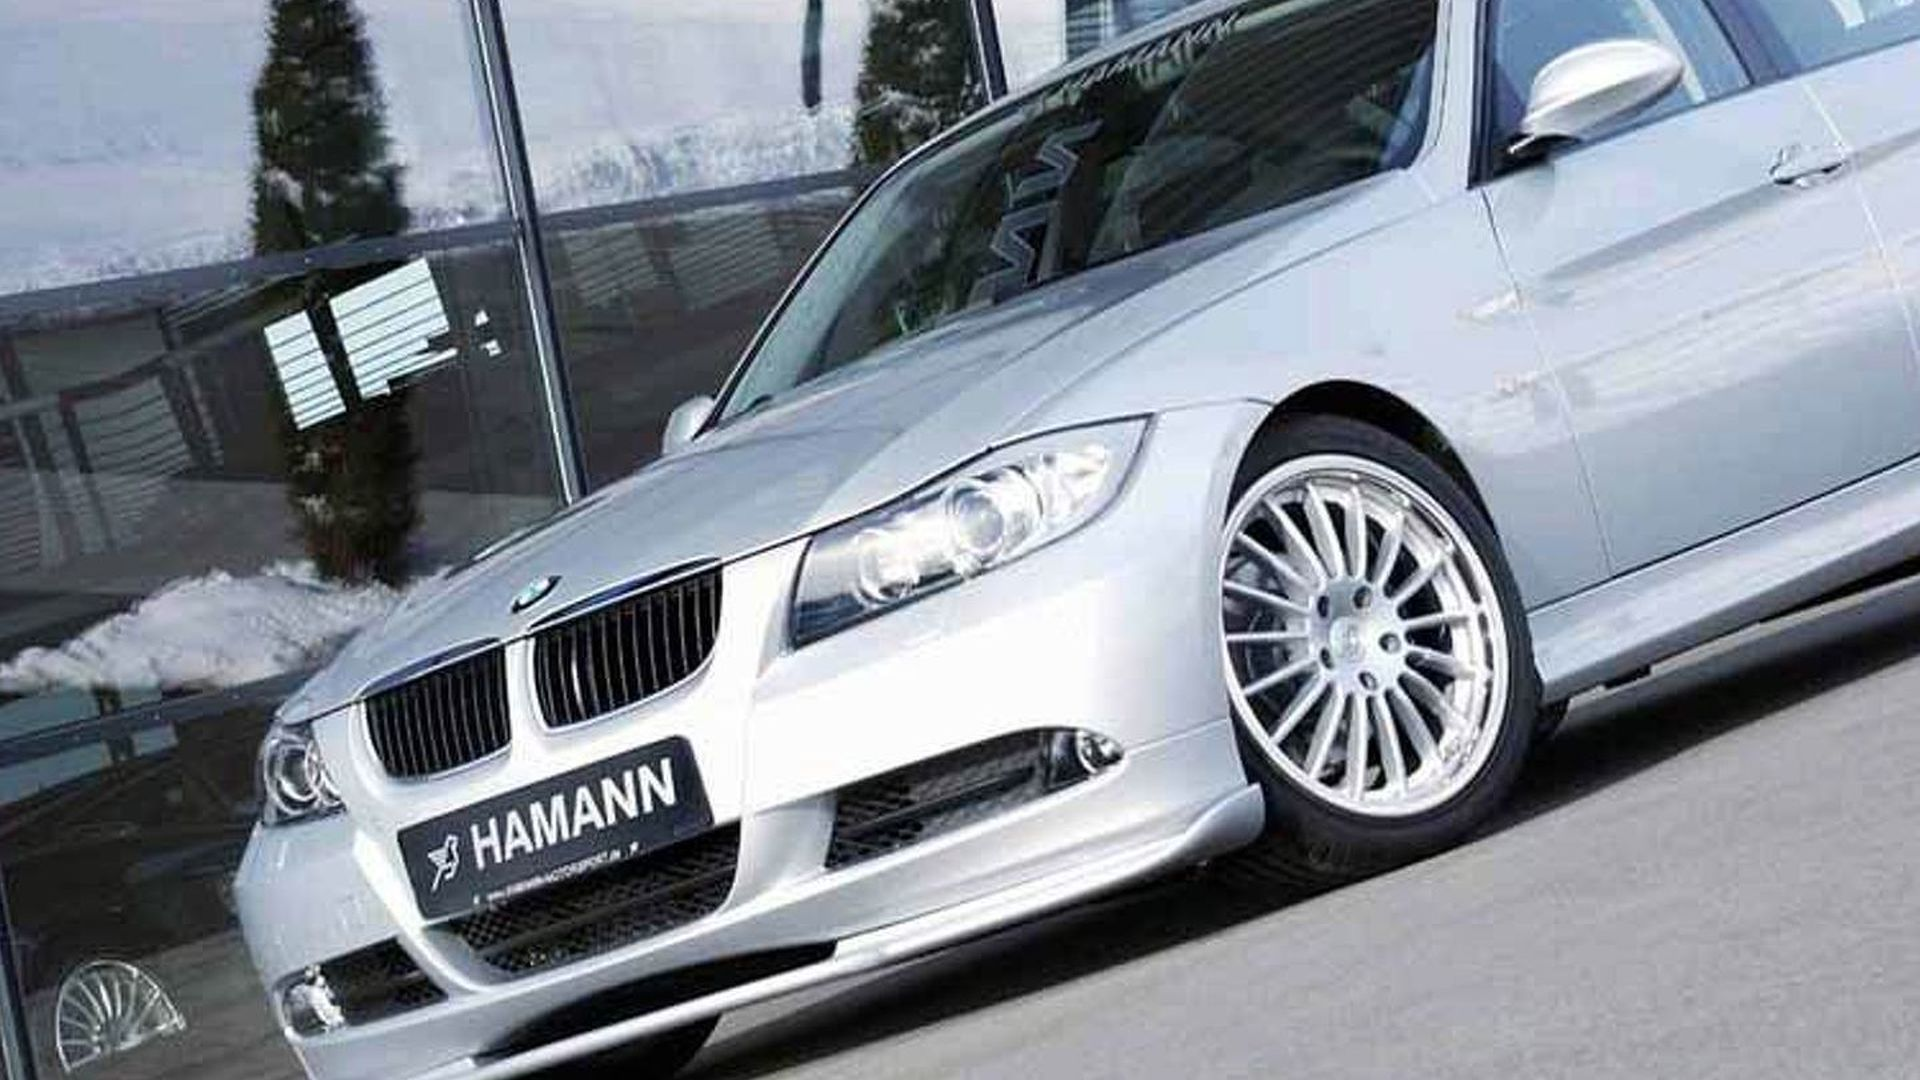 Hamann Accessories For The New Bmw 3 Series Sedan Motor1 Com Photos